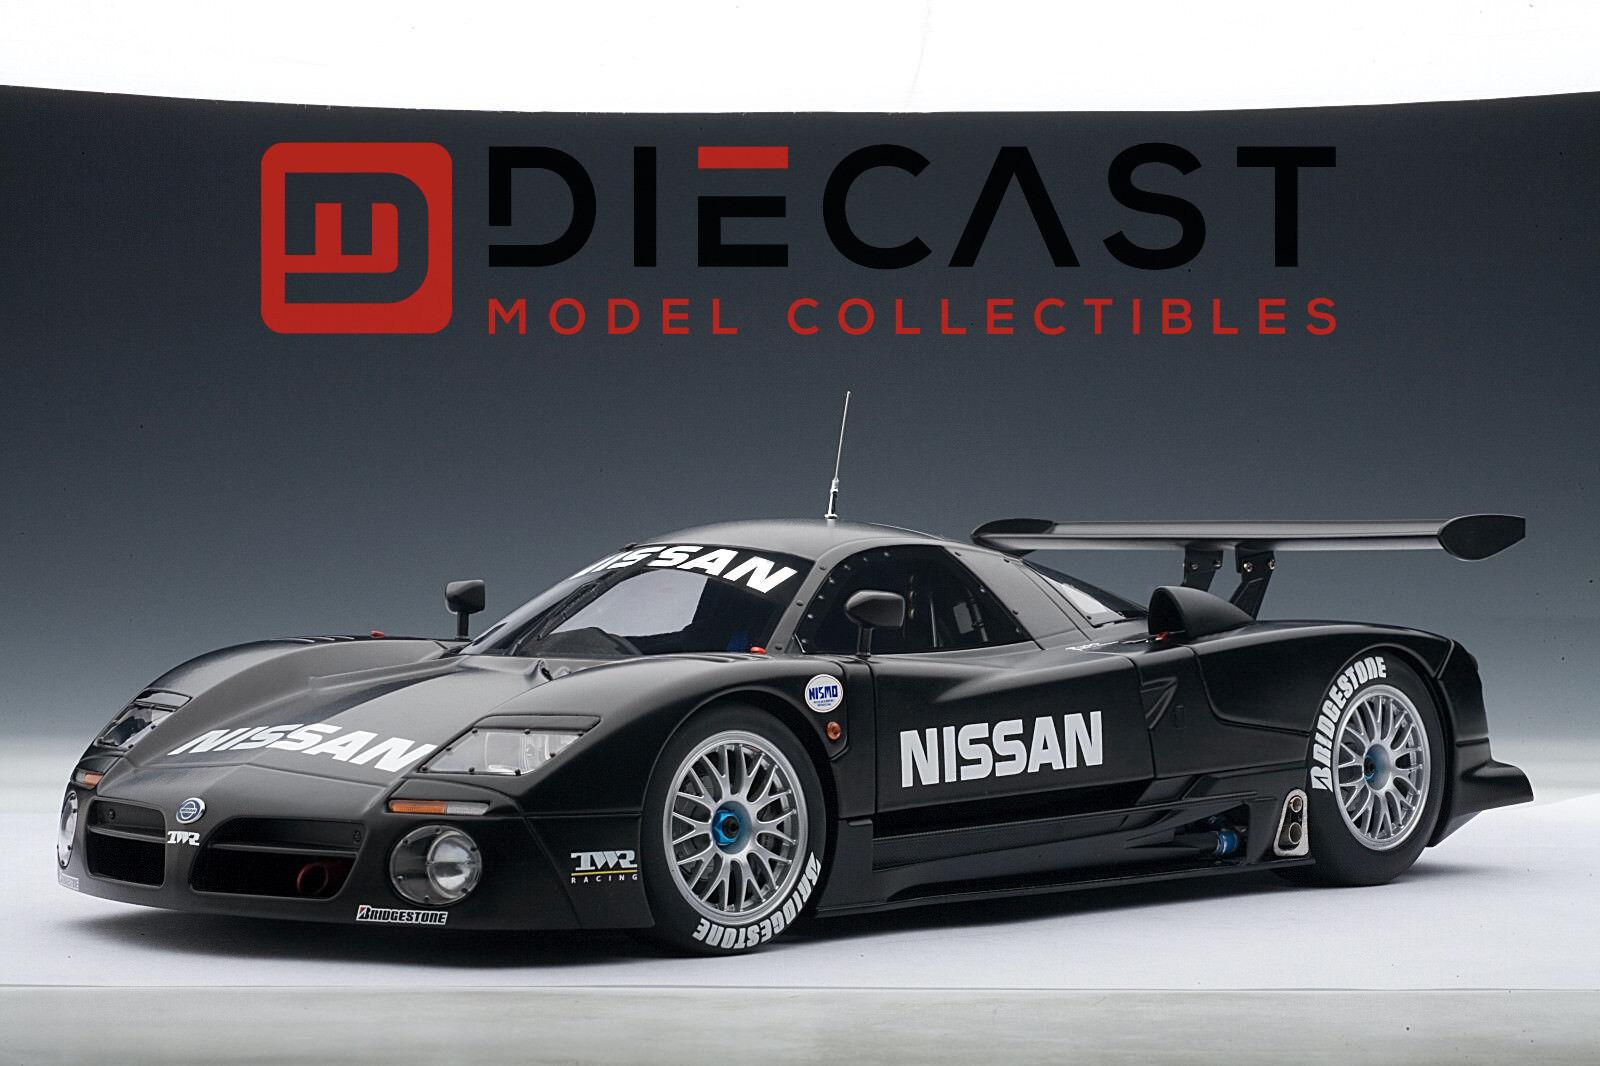 Autoart Autoart Autoart 89778 Nissan R390 GT1 Lemans 2018 Test Coche 1:18TH Escala e64200